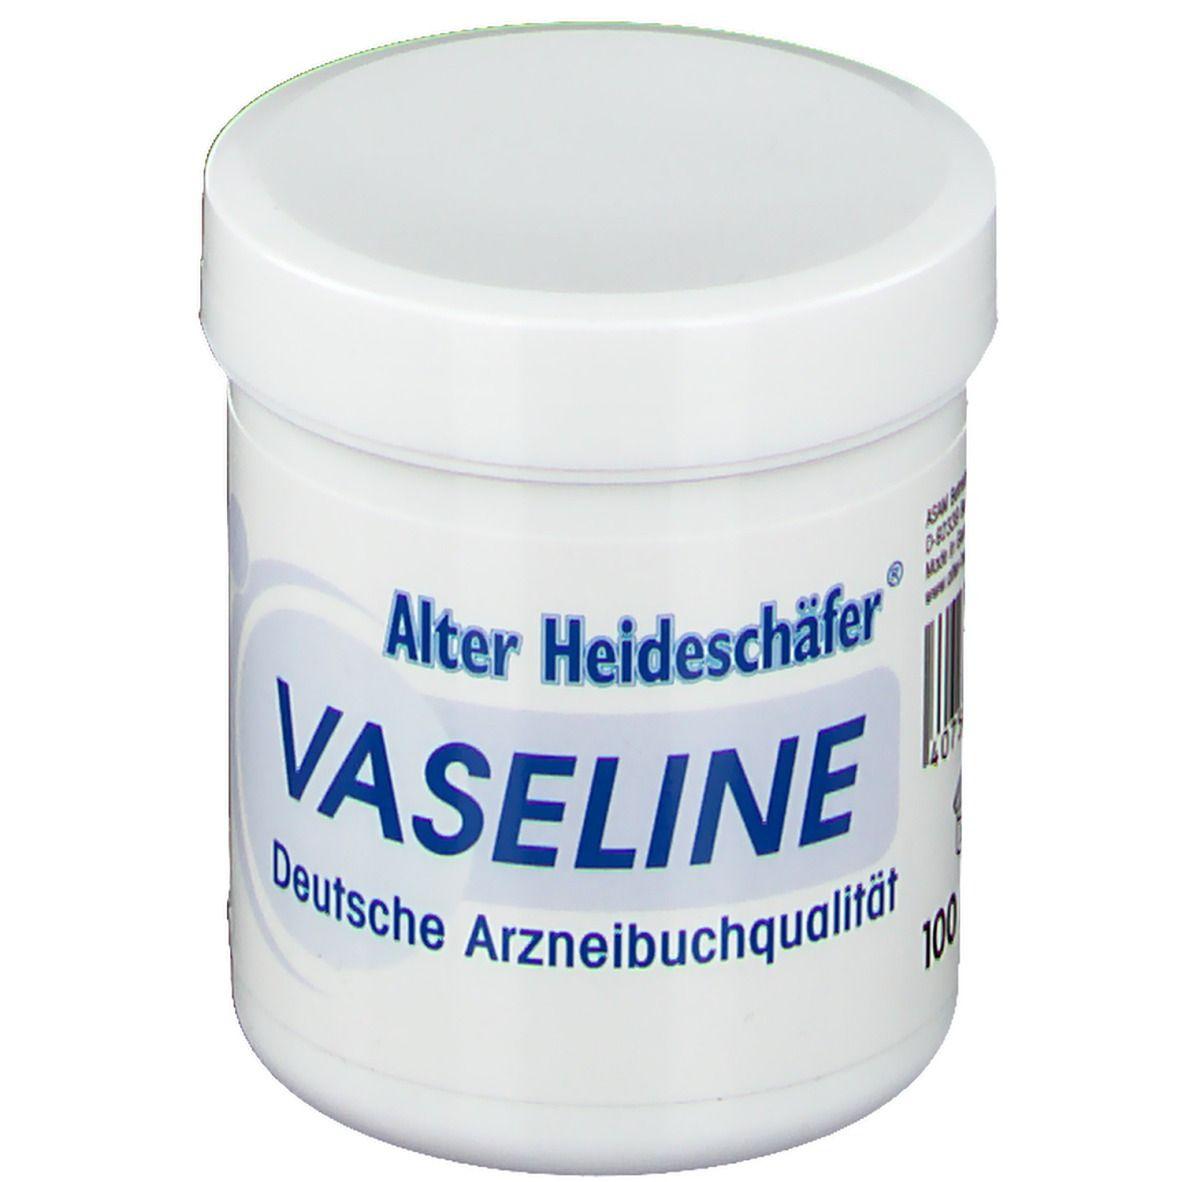 Image of Alter Heideschäfer® Vaseline